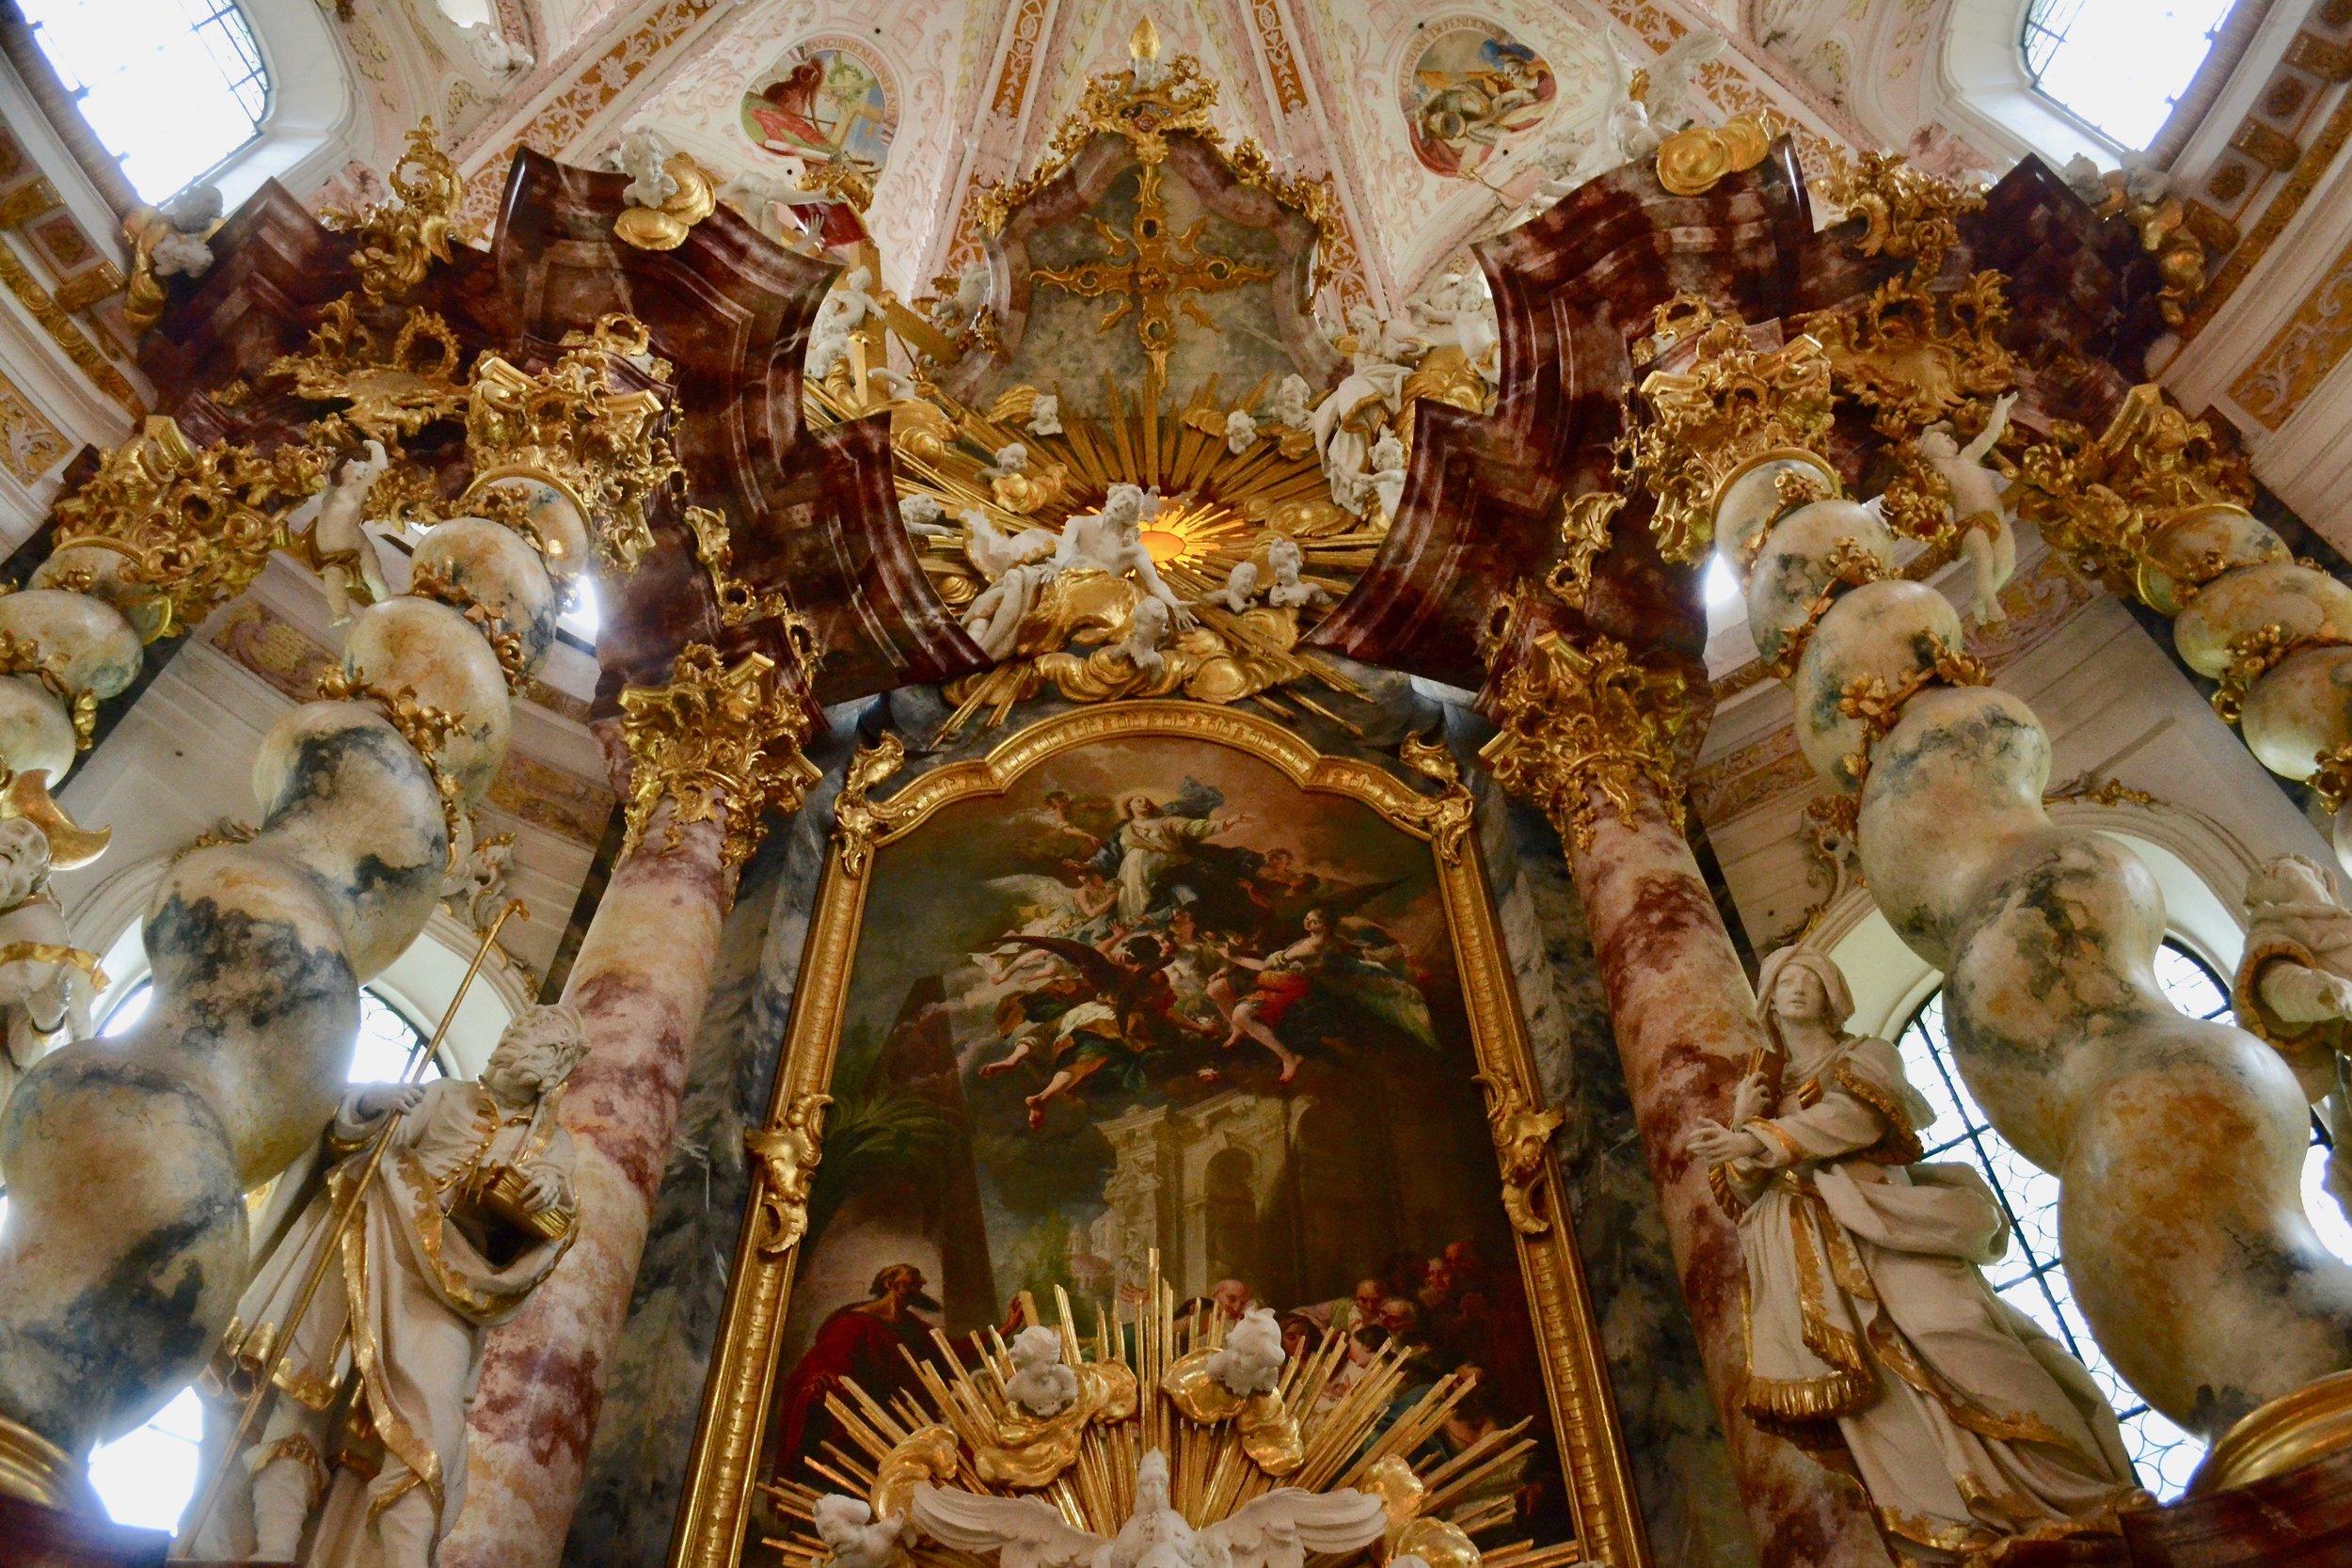 The High Altar in Fürstenfeld Abbey